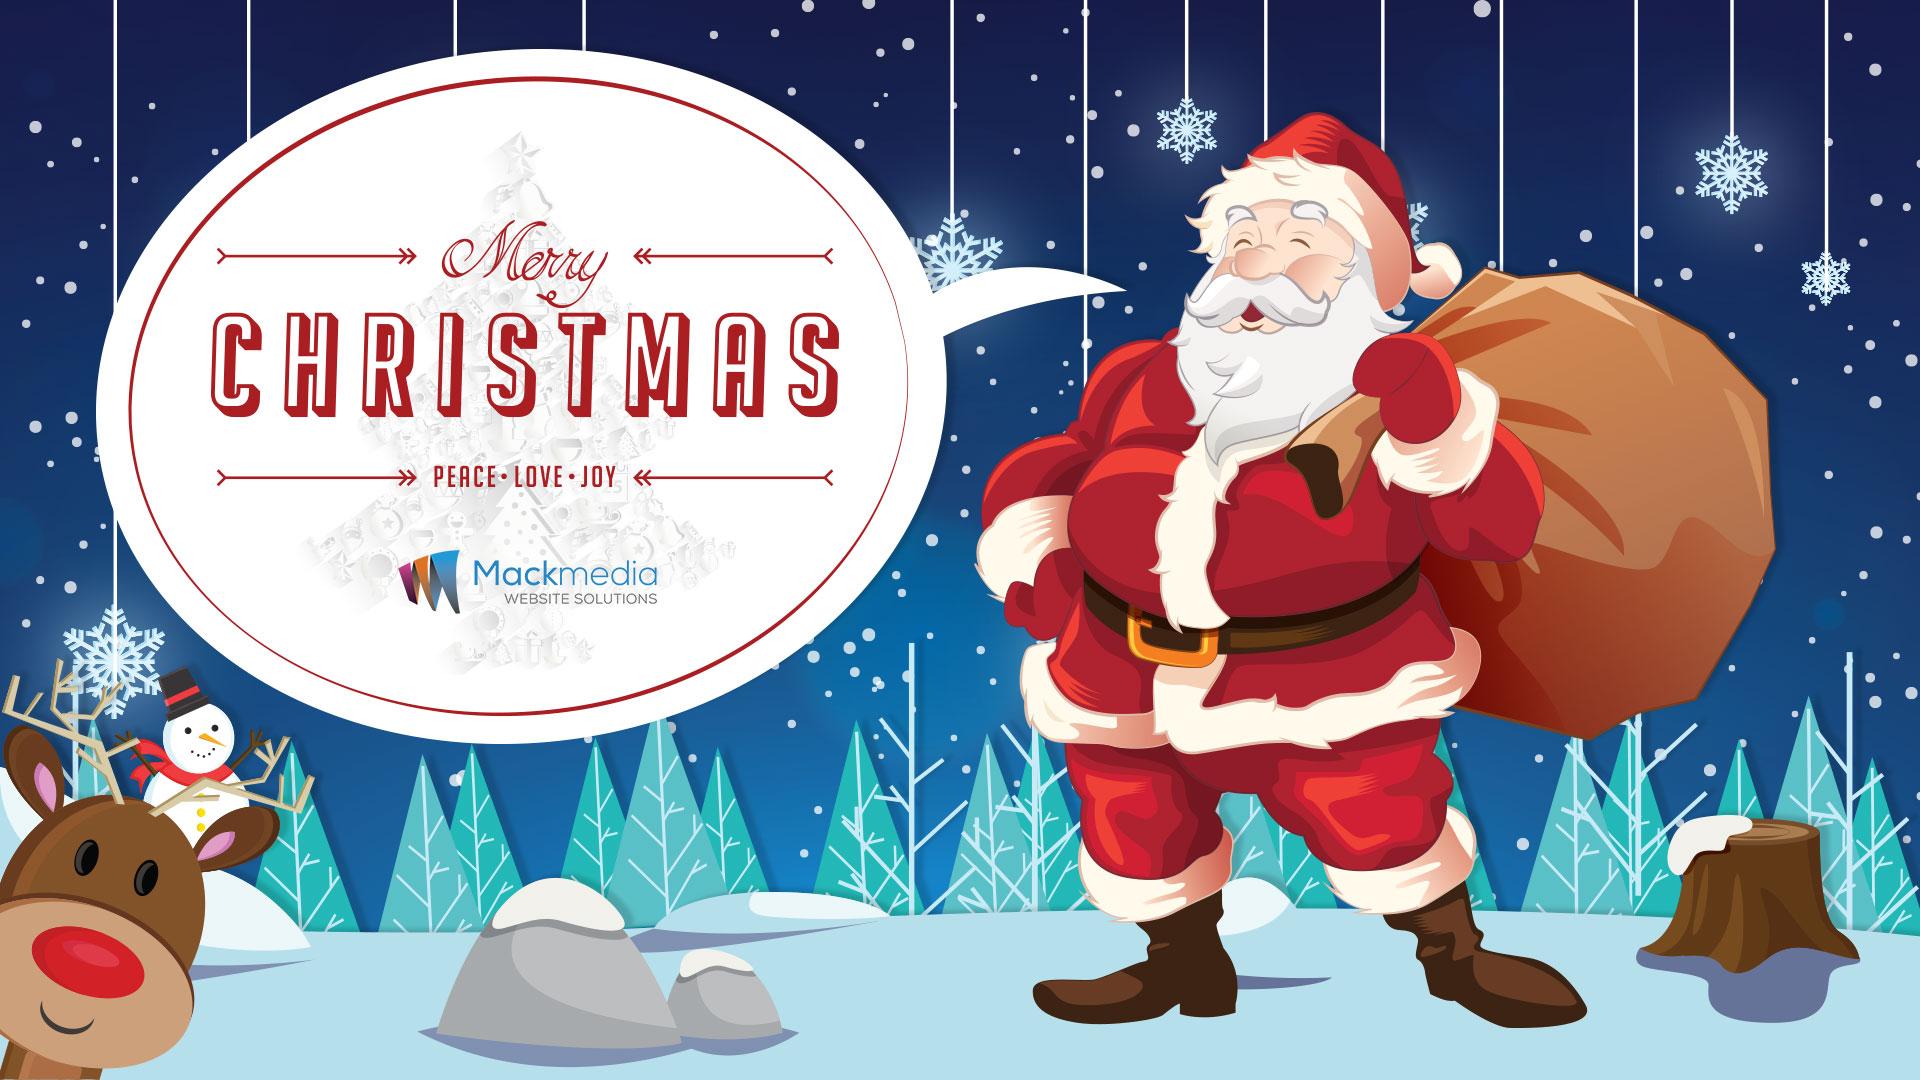 merry-christmas-2018_1920x1080